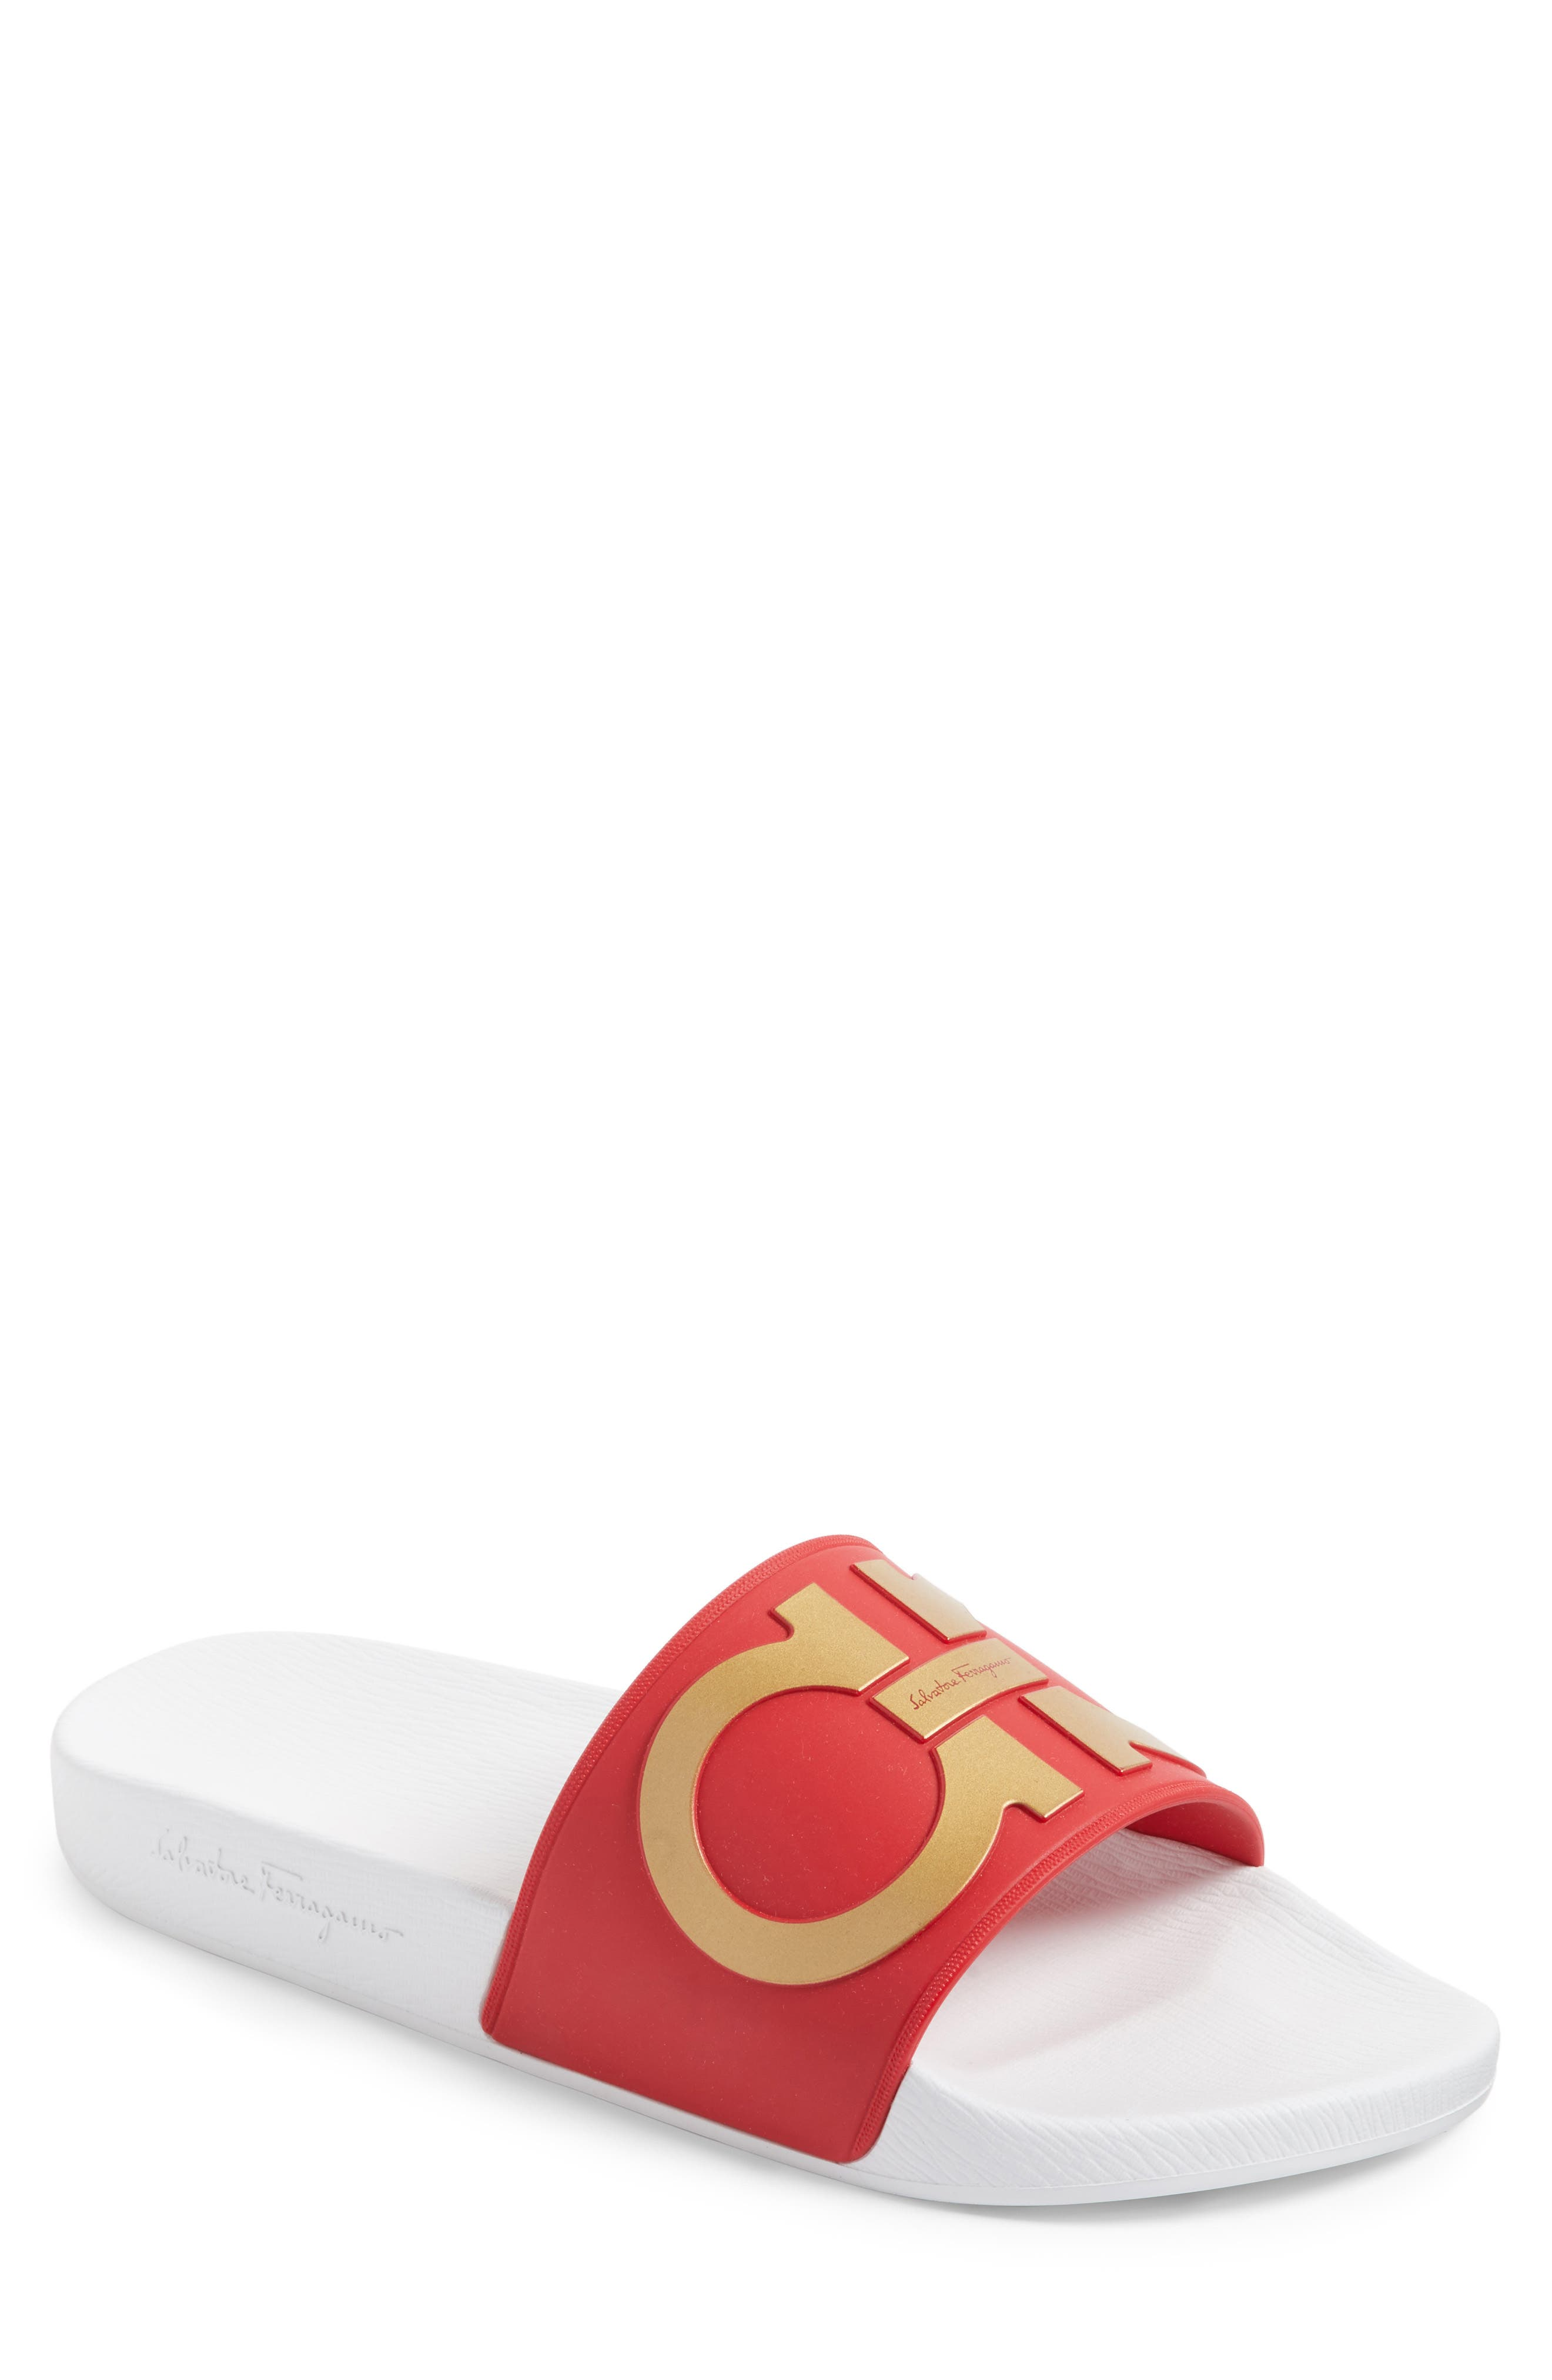 SALVATORE FERRAGAMO 'Groove' Slide Sandal